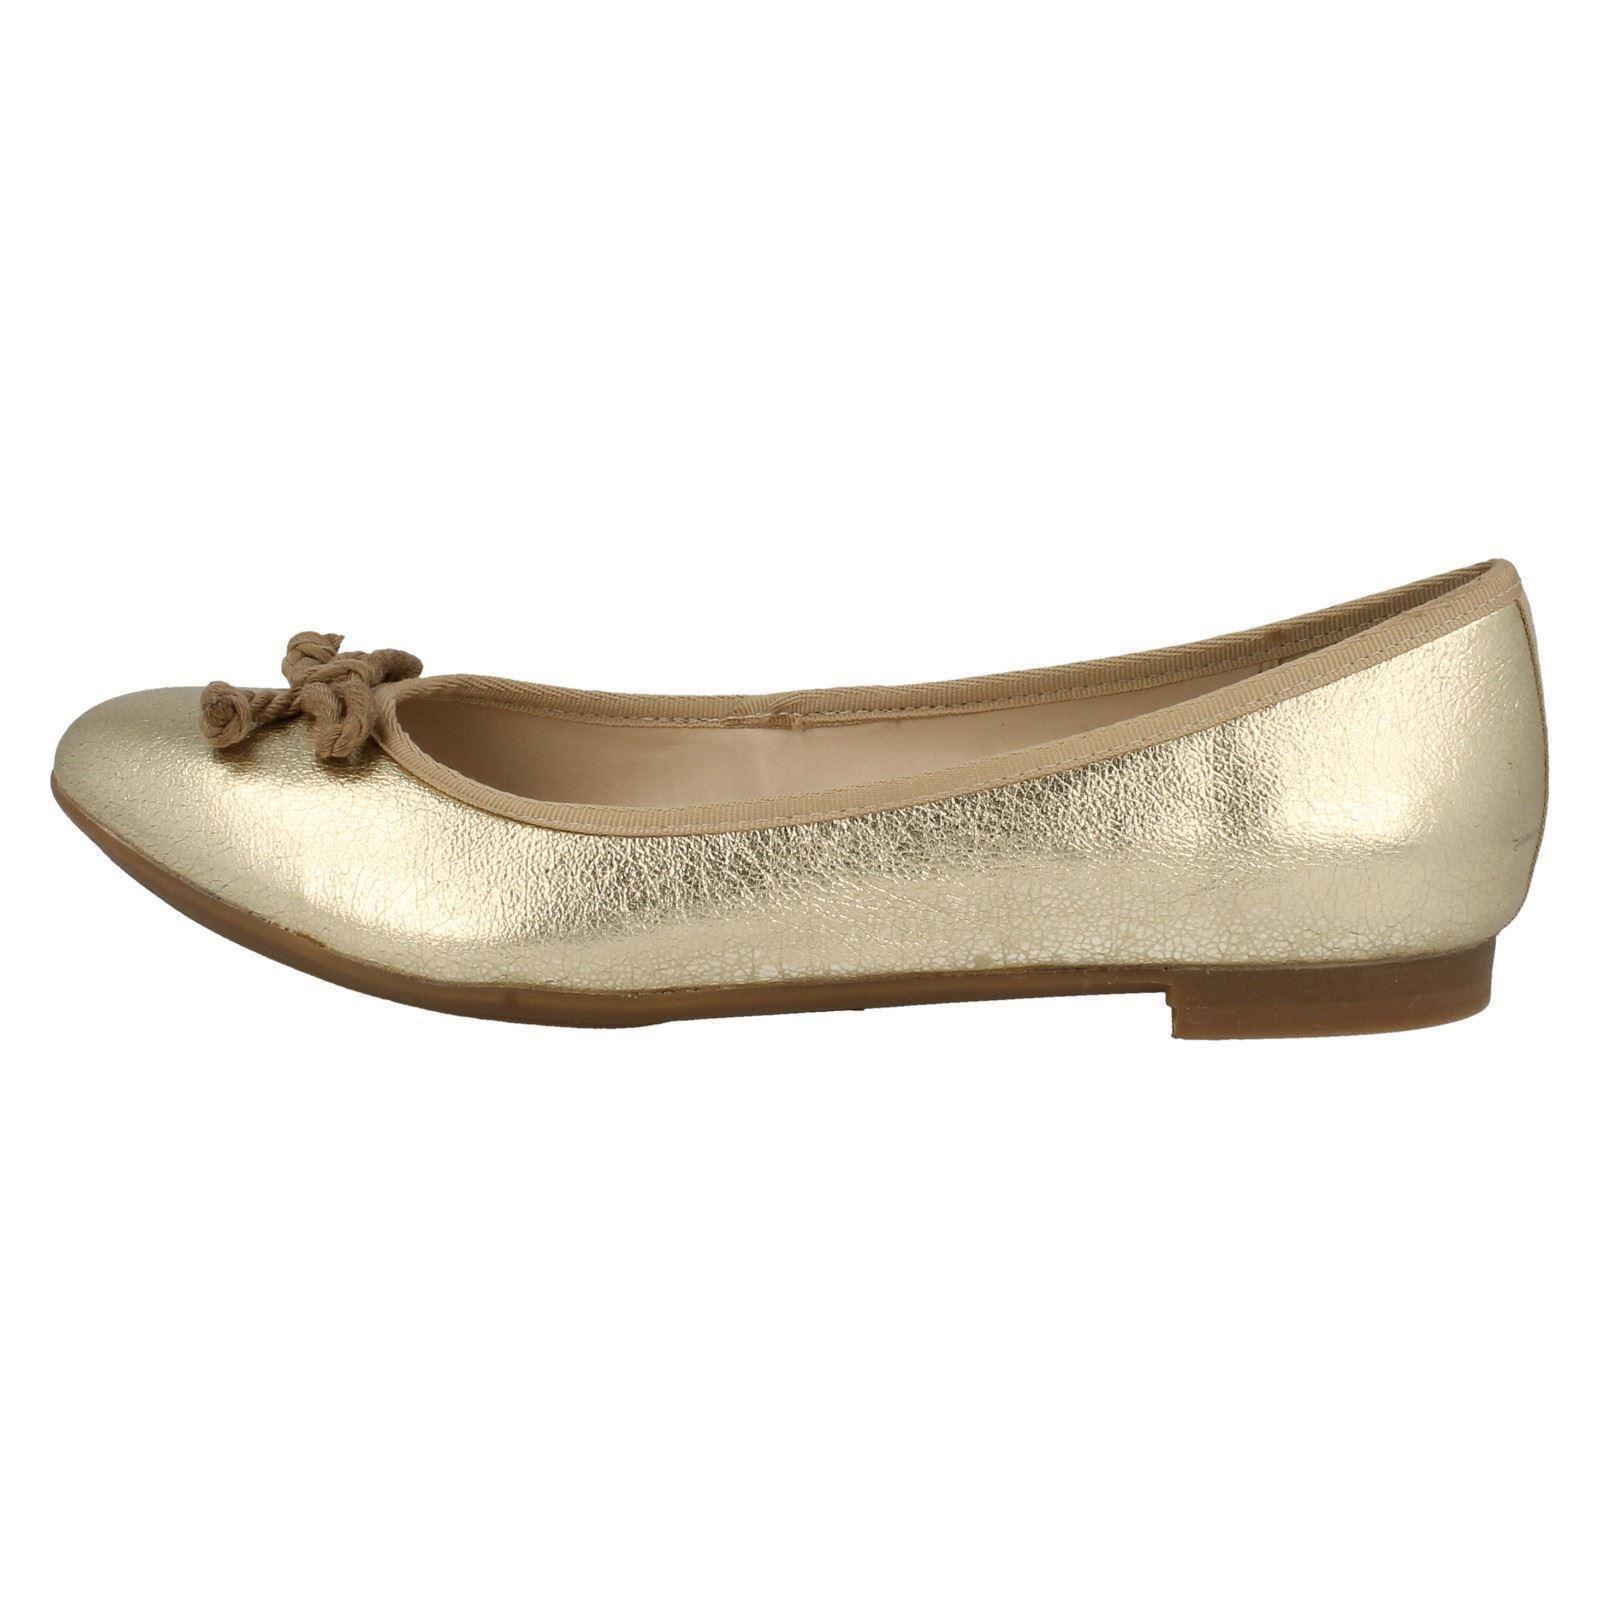 Clark Ladies Slip On Shoes Sale